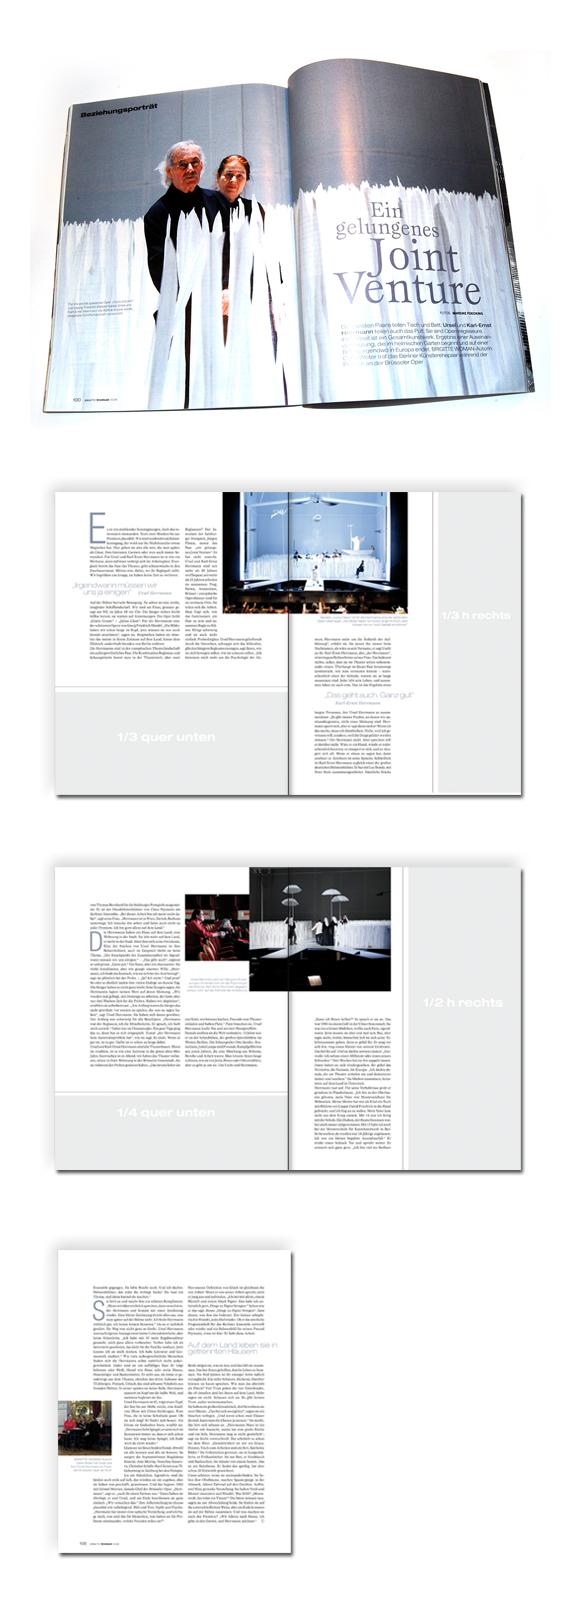 BW Seiten Joint Venture Paarportrait